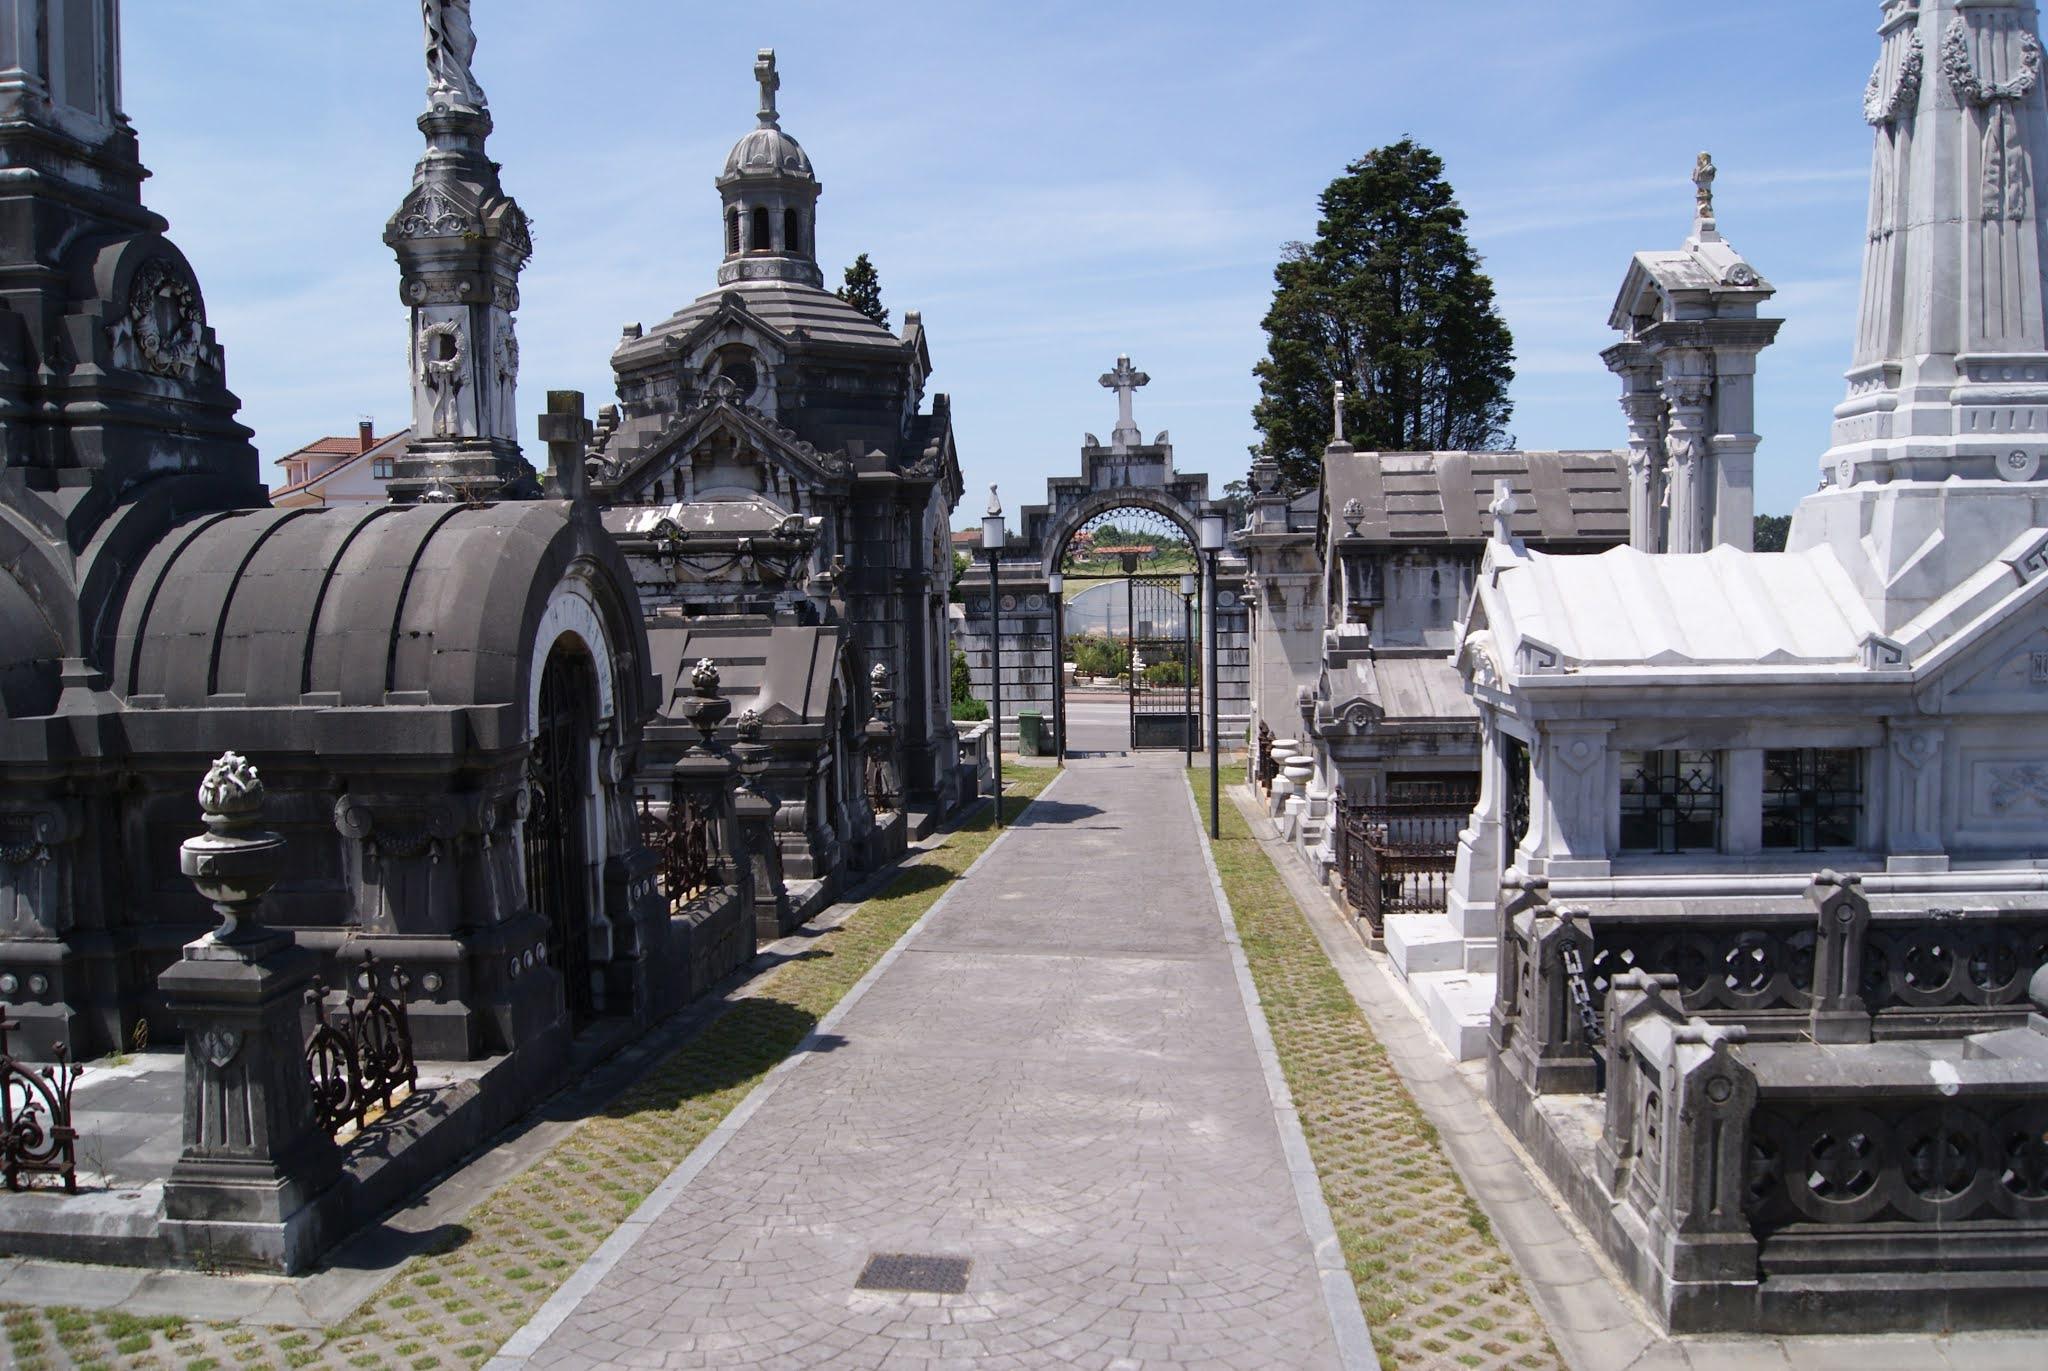 Cemetery of La Carriona (Aviles, Spain)